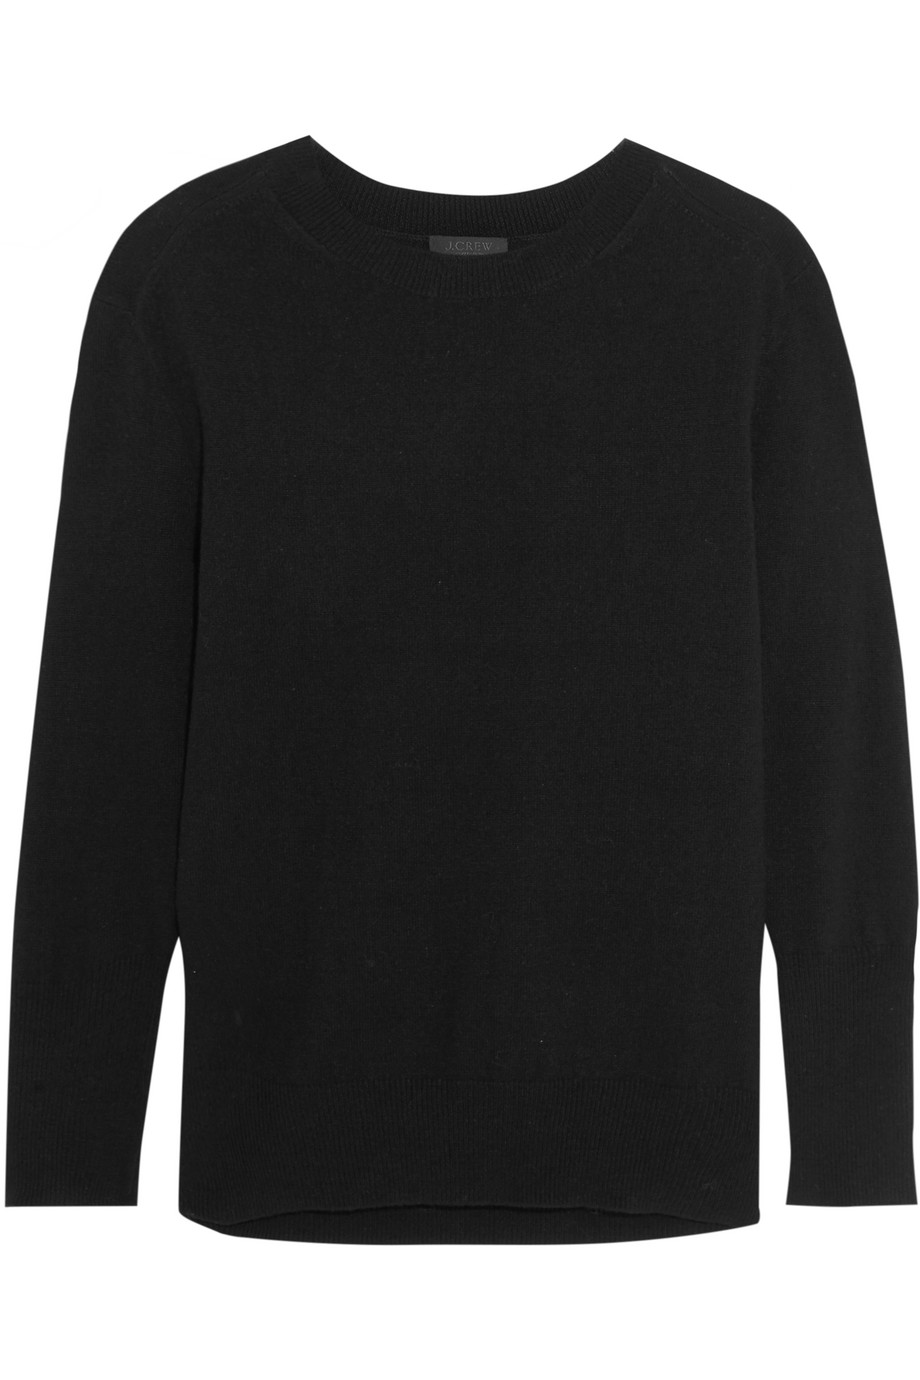 J.Crew Cashmere Sweater, Black, Women's, Size: XL